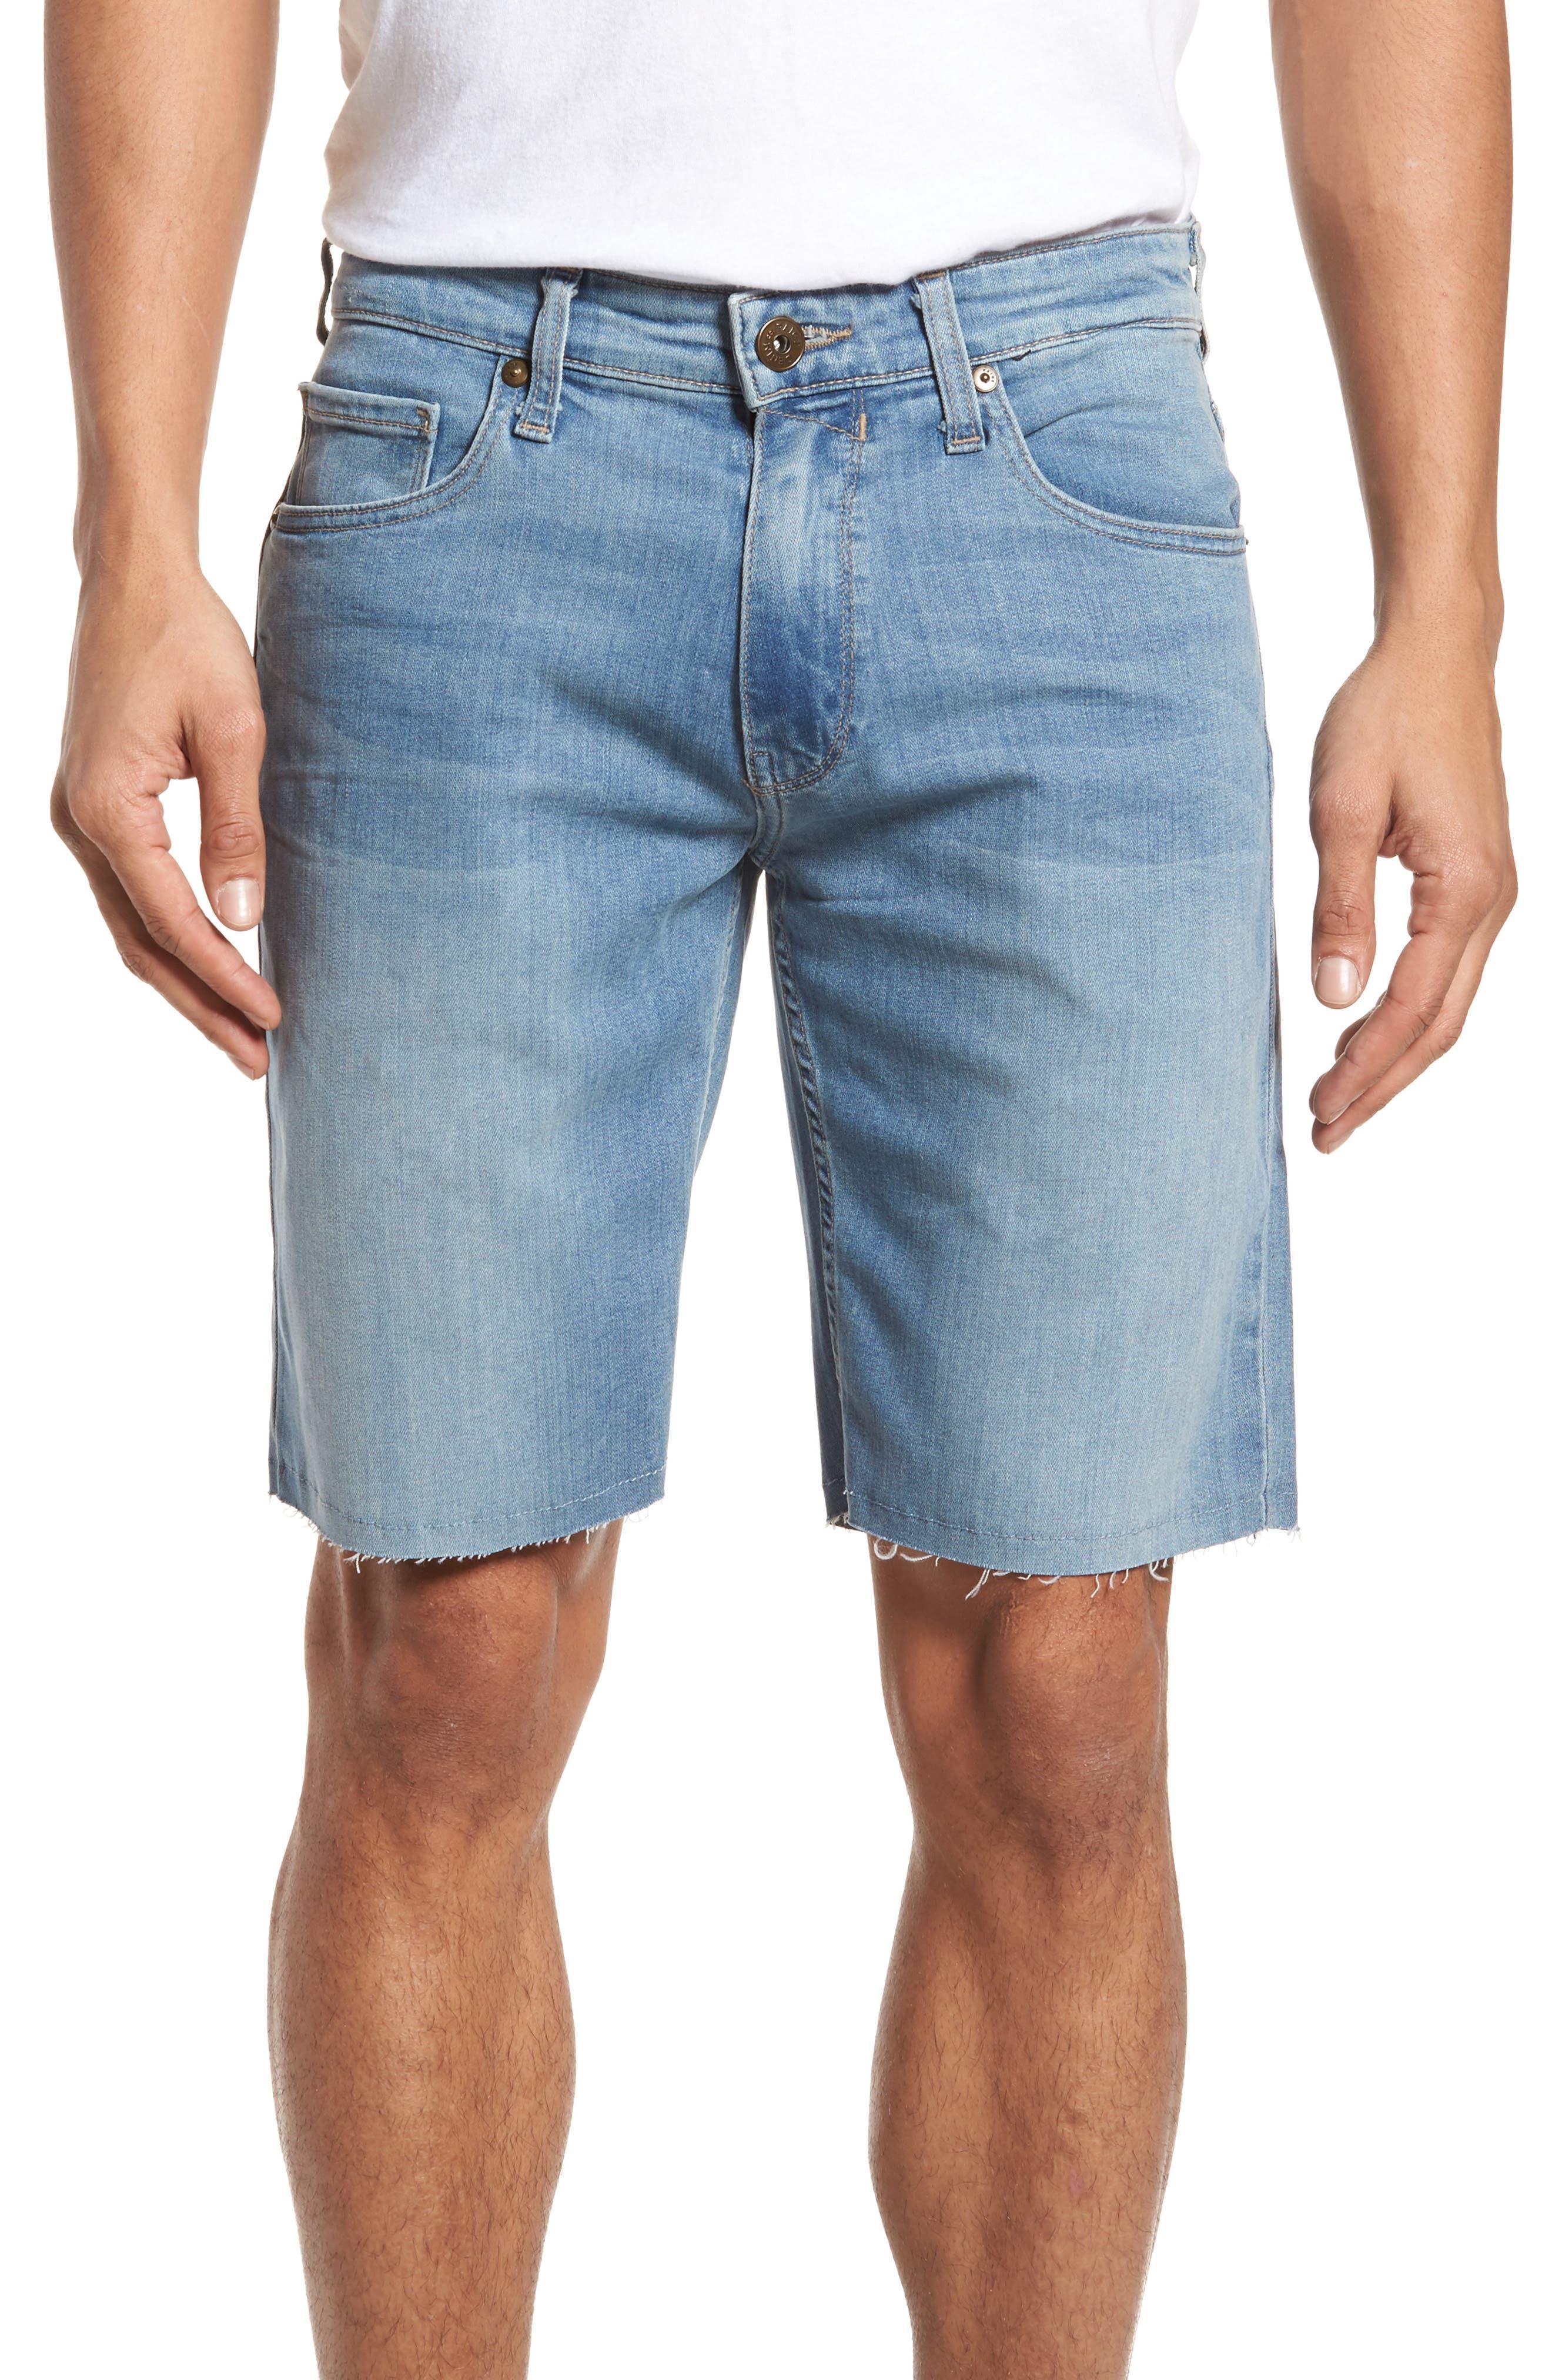 Transcend - Federal Slim Straight Leg Denim Shorts,                             Main thumbnail 1, color,                             400